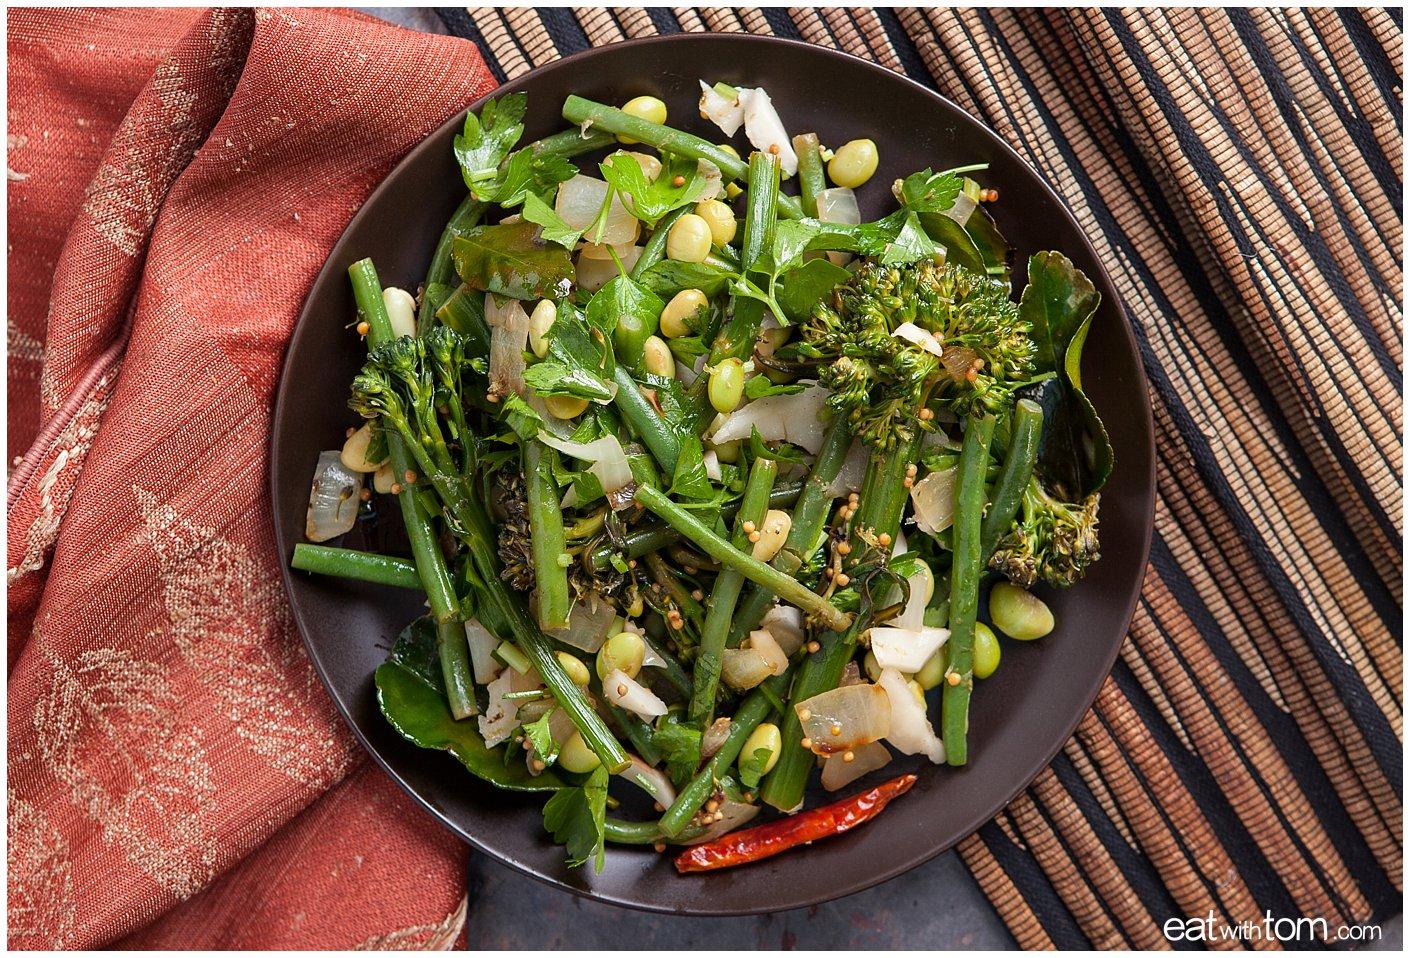 Asian green bean coconut broccolini recipe edamame eat with tom